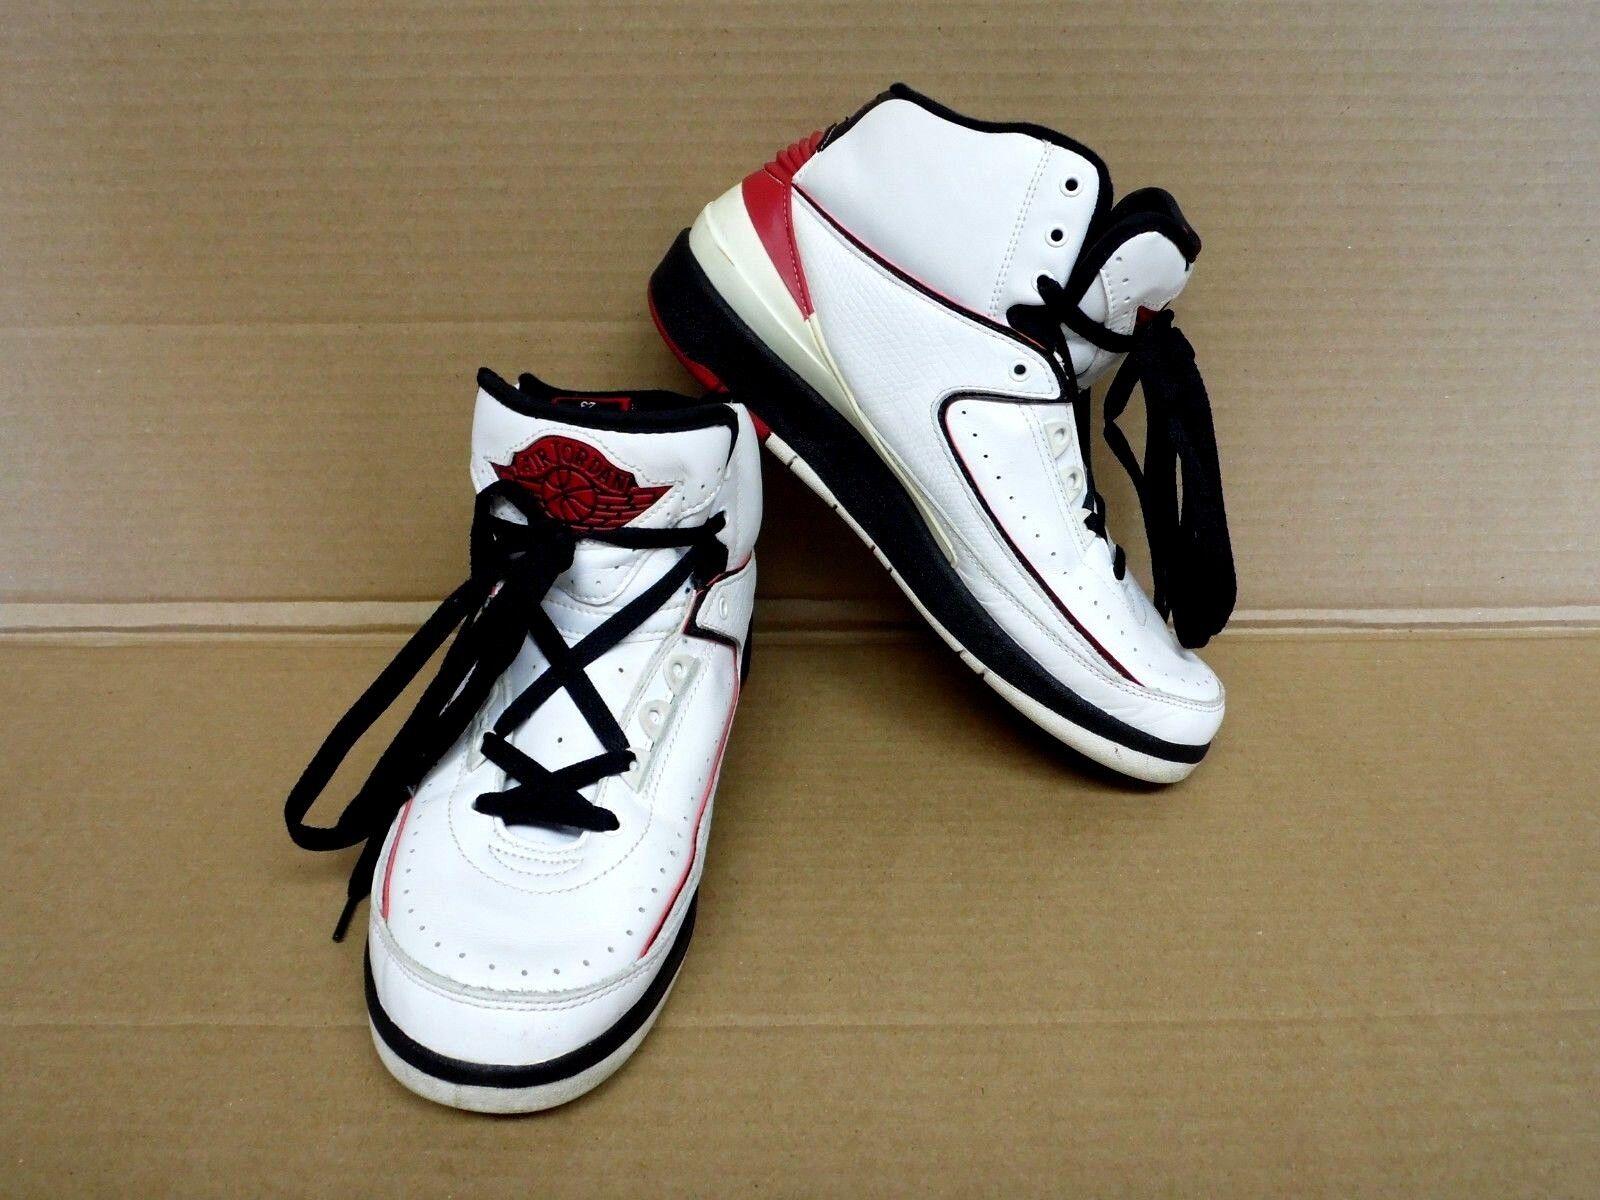 Nike Air Jordan Retro 2 Mens Basketball shoes Sz 8 White Varsity Red 308308-161